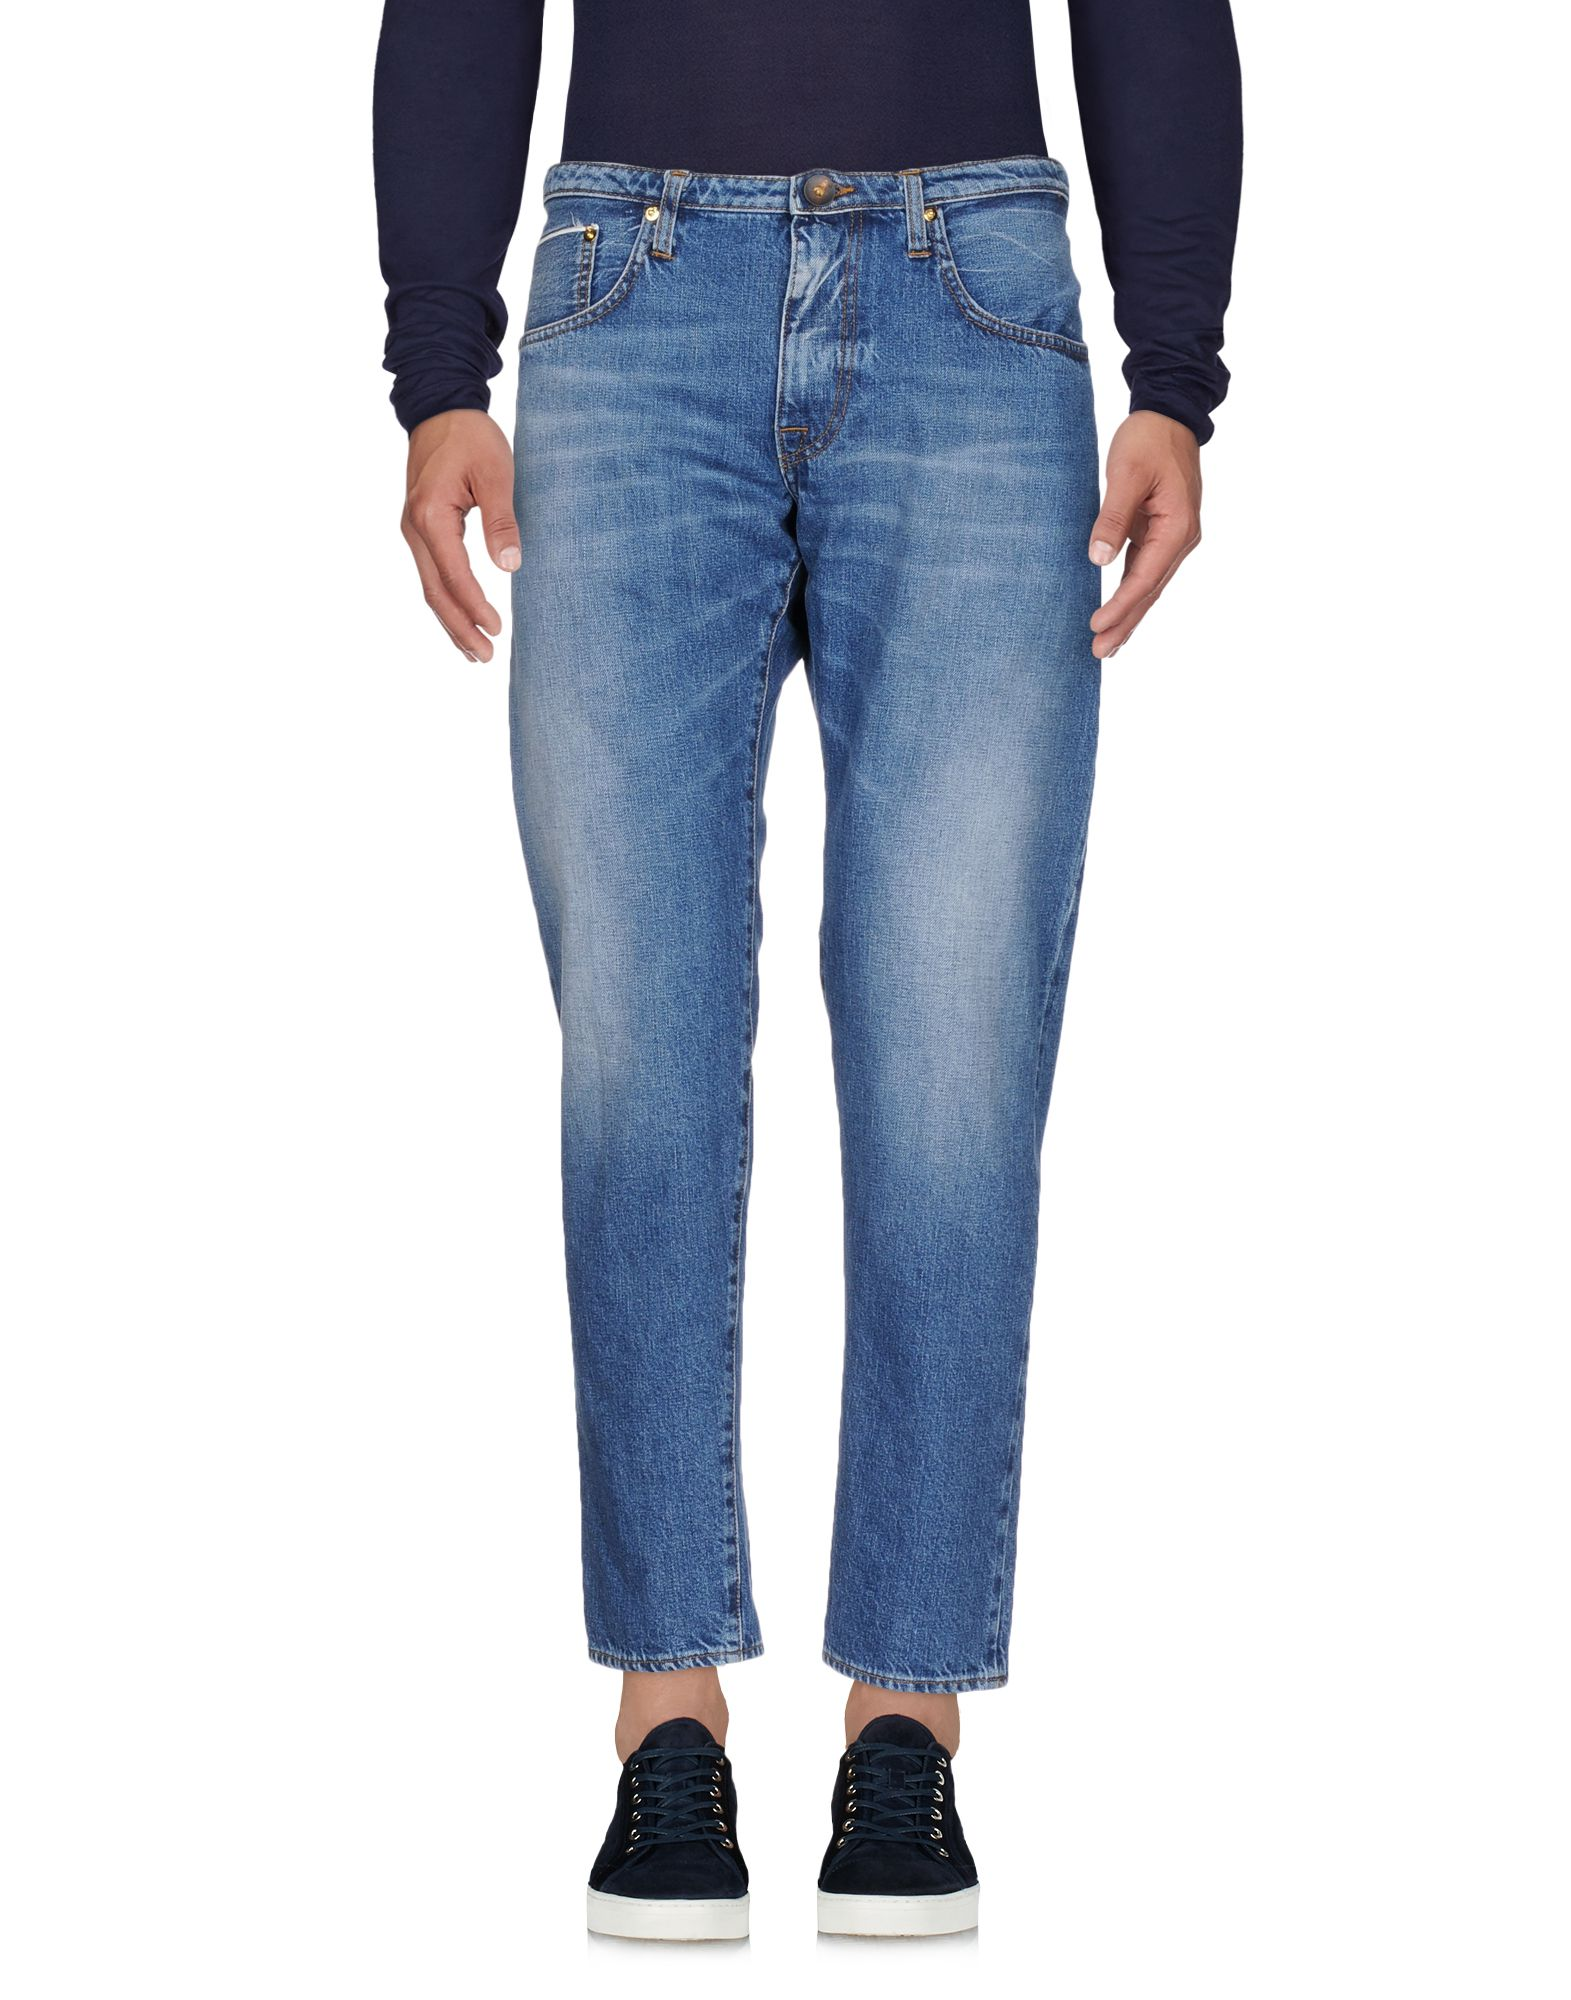 Pantaloni Jeans (+) People Donna - Acquista online su